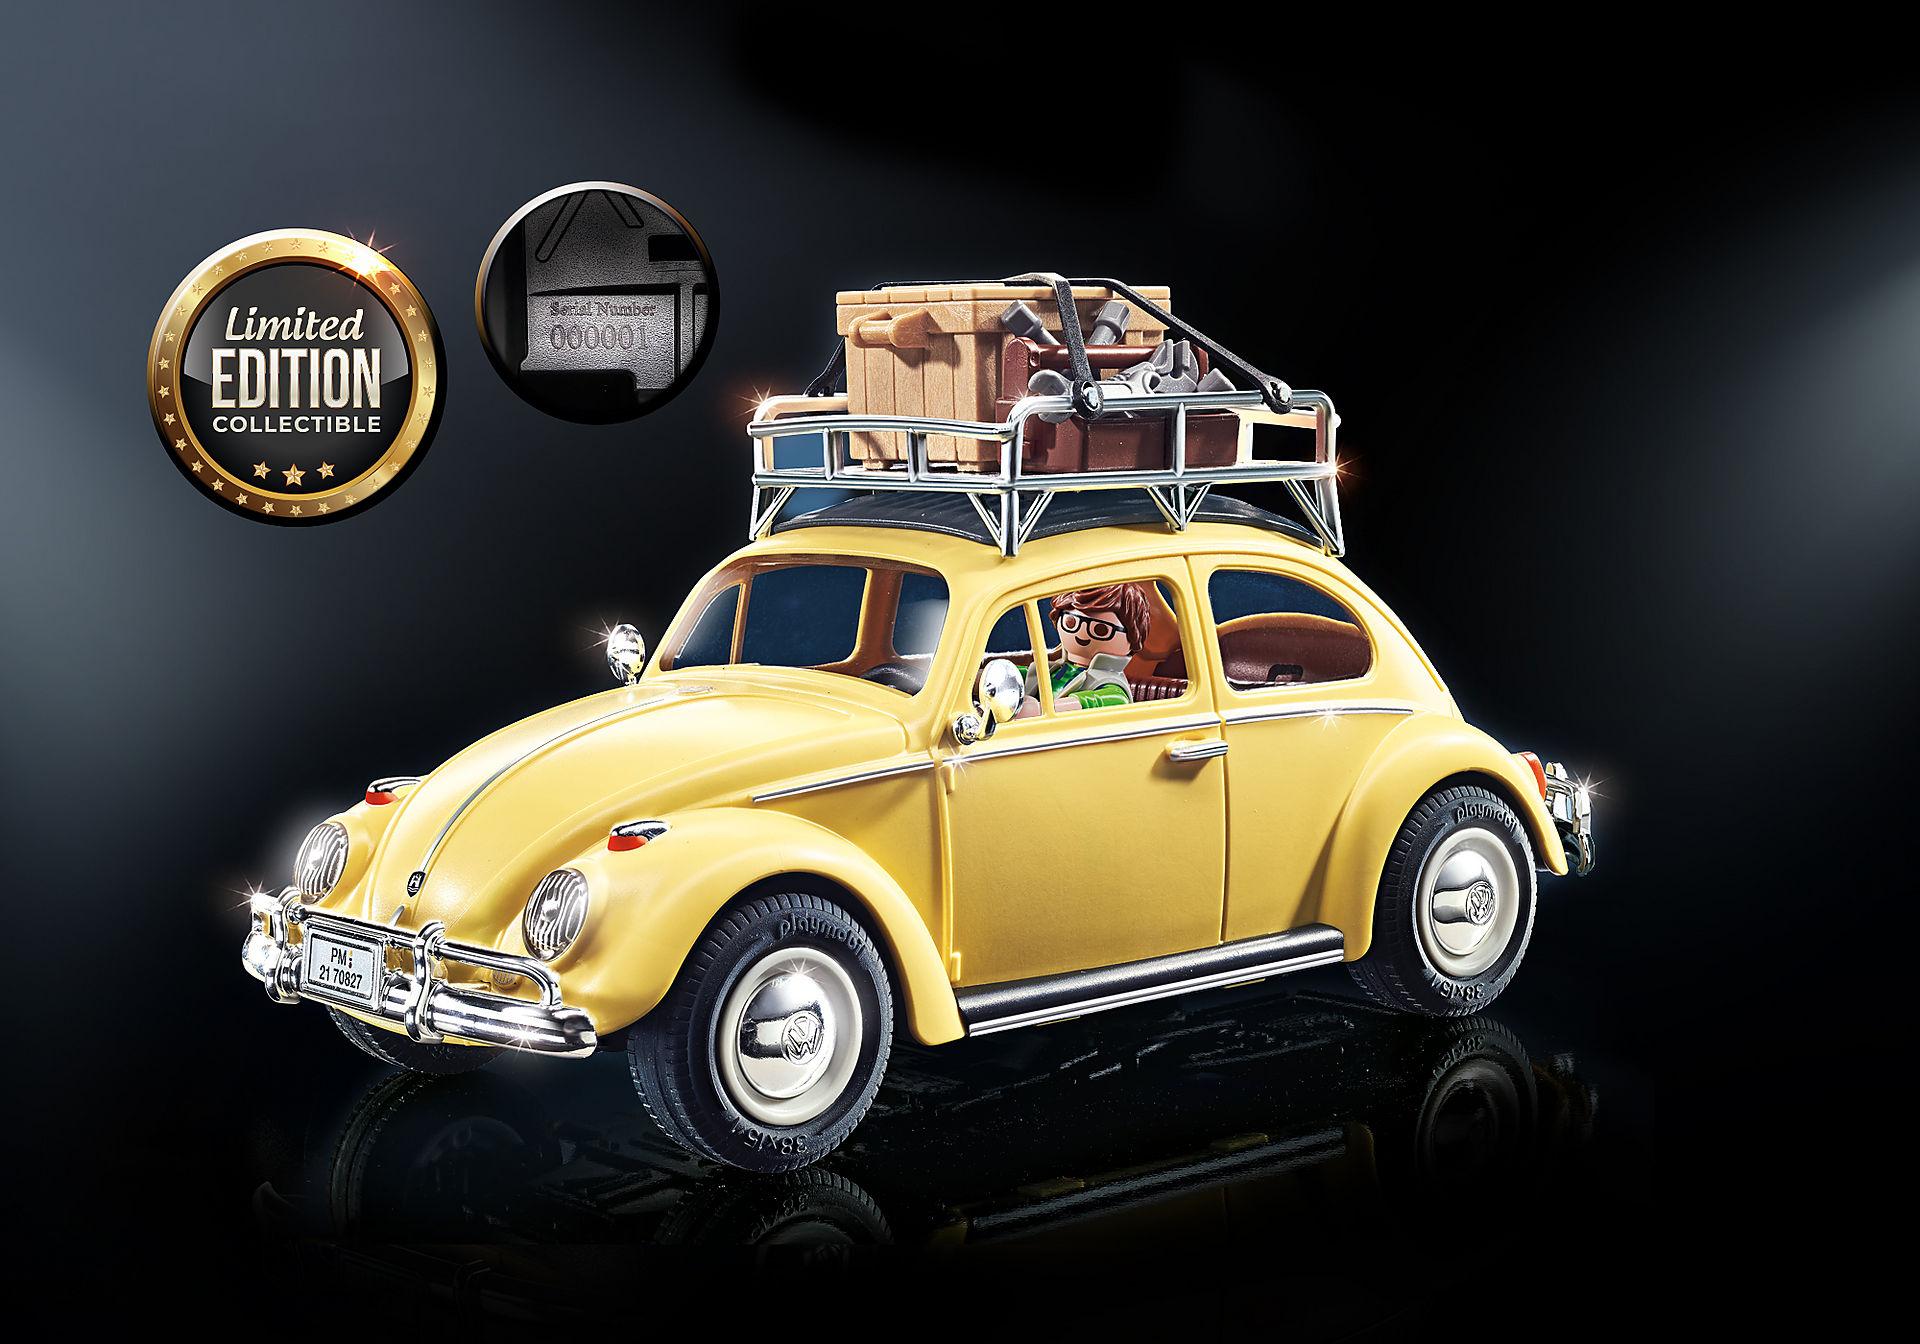 70827 Volkswagen Beetle - Edição especial zoom image1